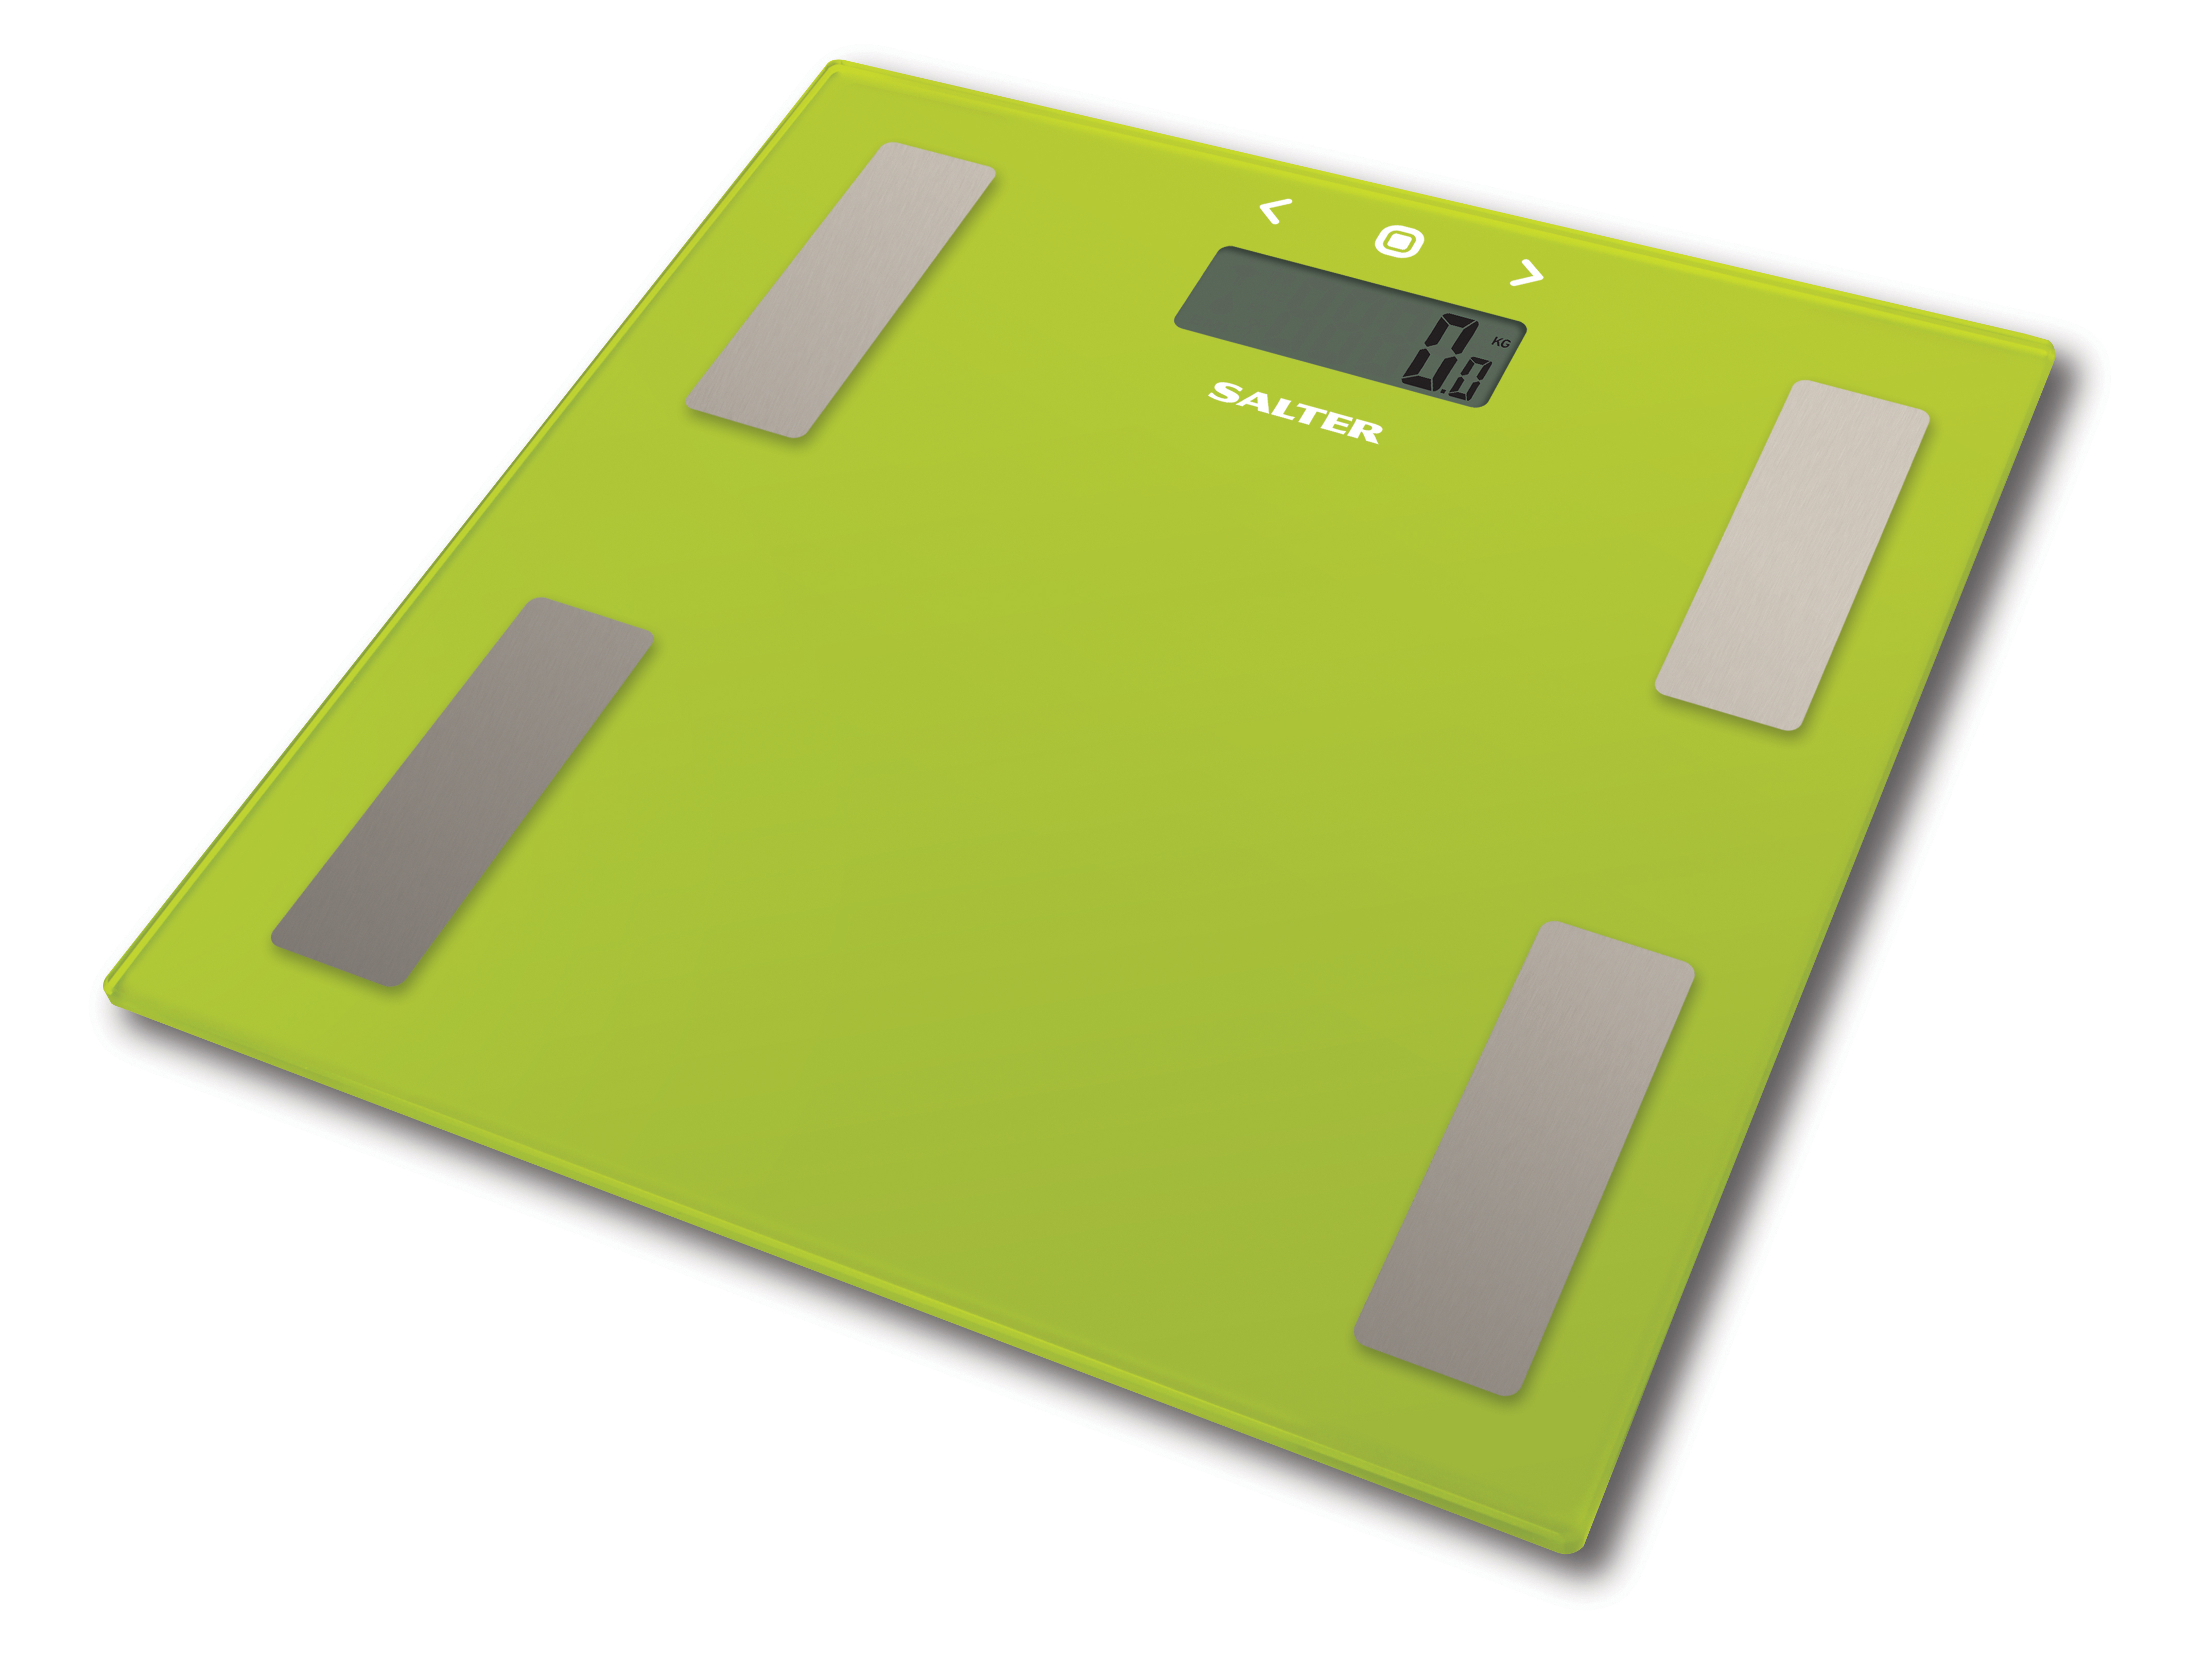 Salter Body Fat Scale Ultra Slim Glass Electronic Digital Bathroom